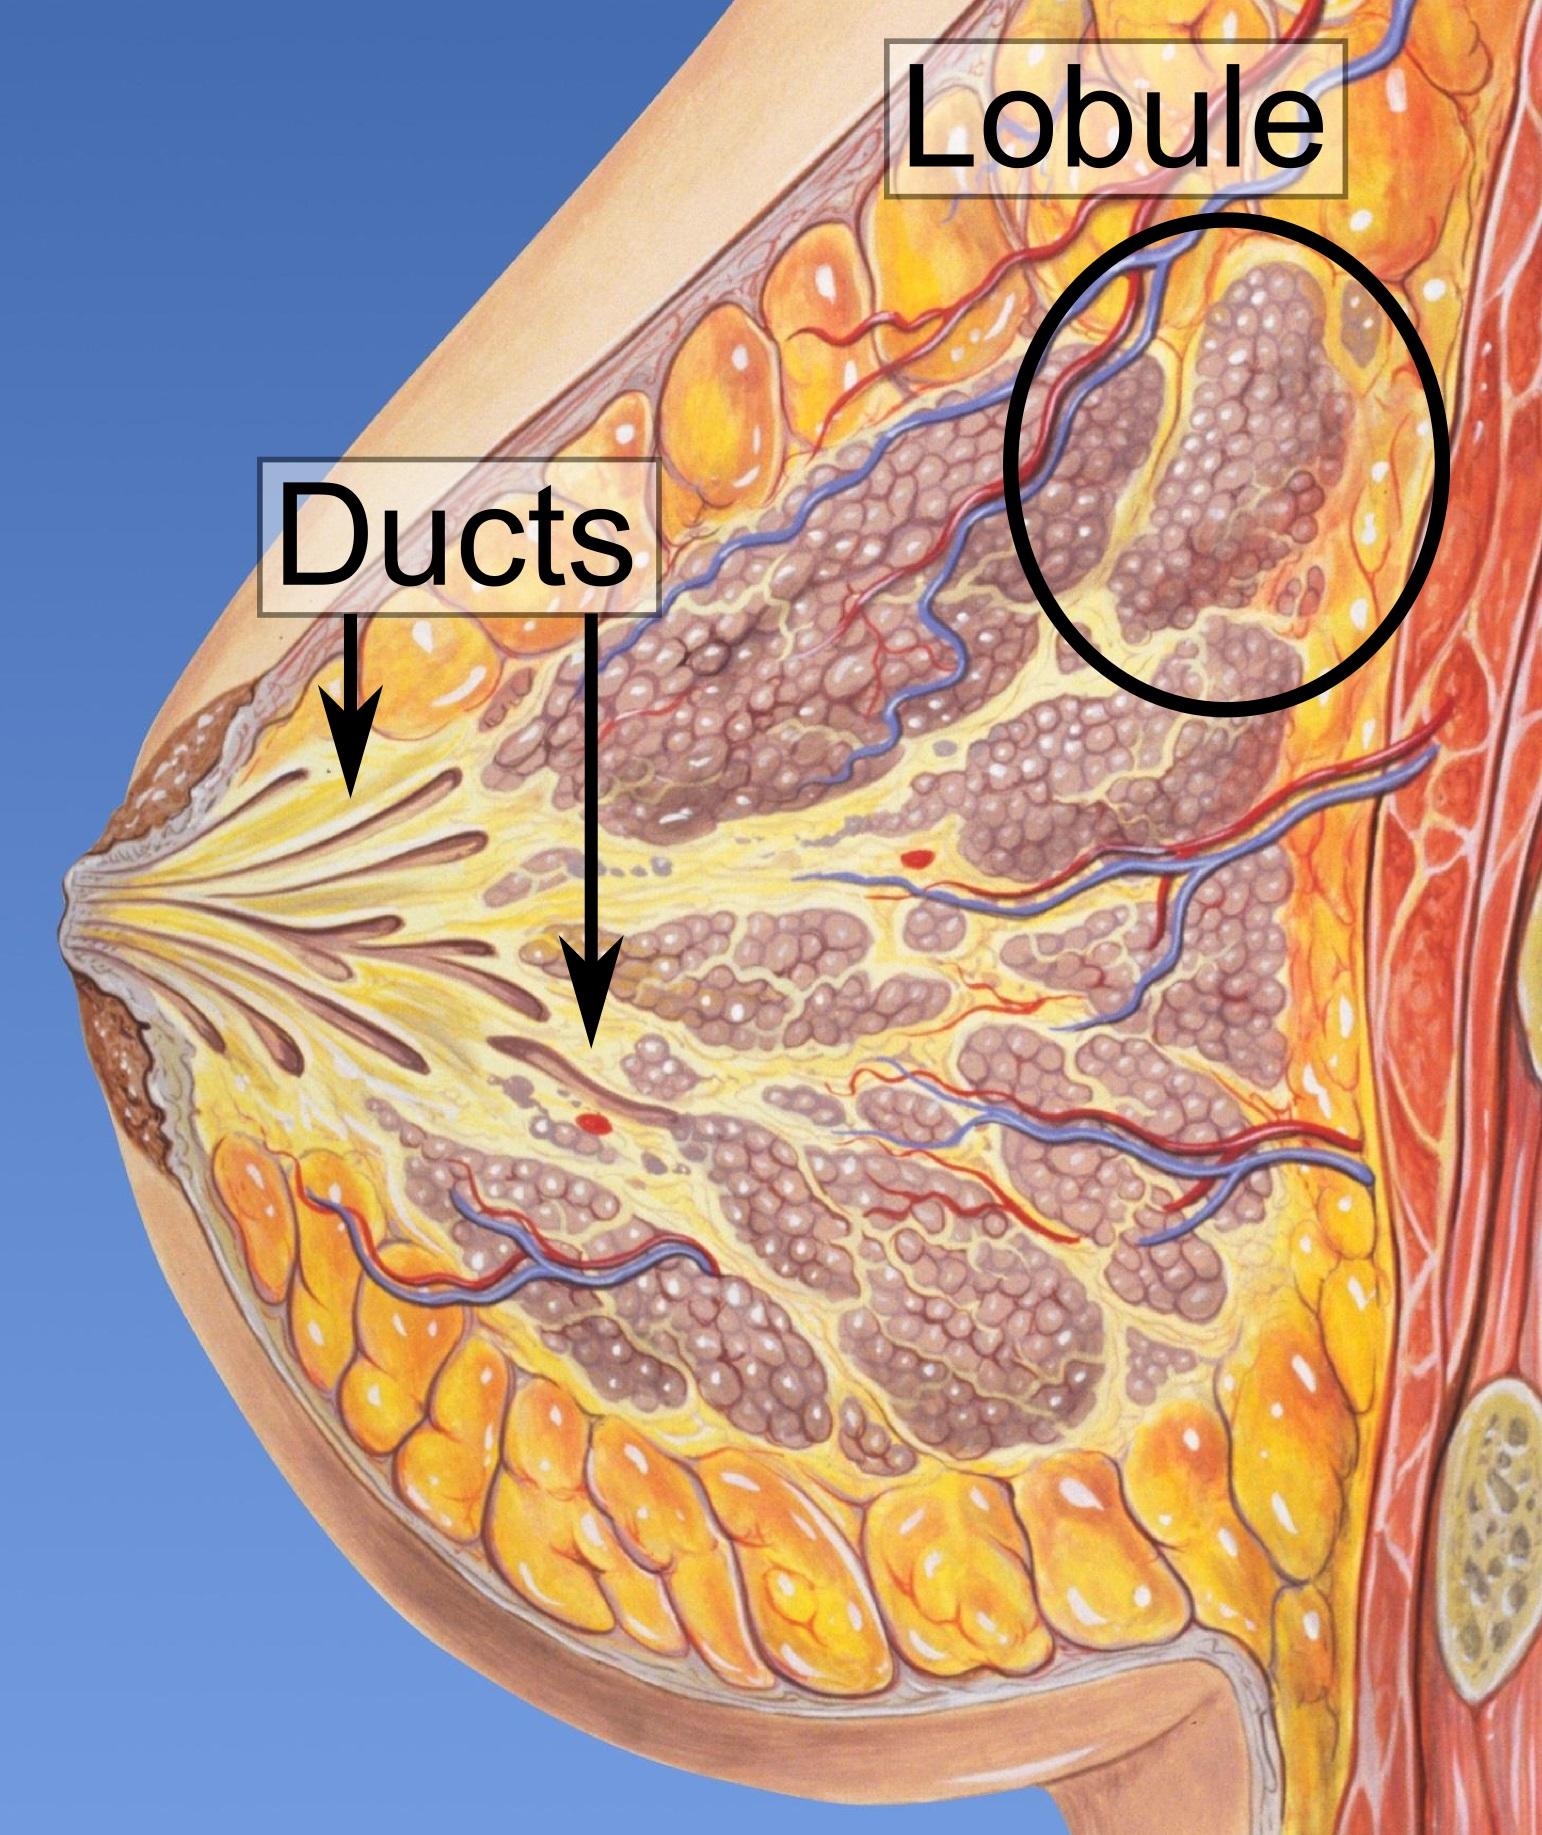 Boots Maternity Ultra Slim Advanced Breast Pads, 1 x 60 Pack